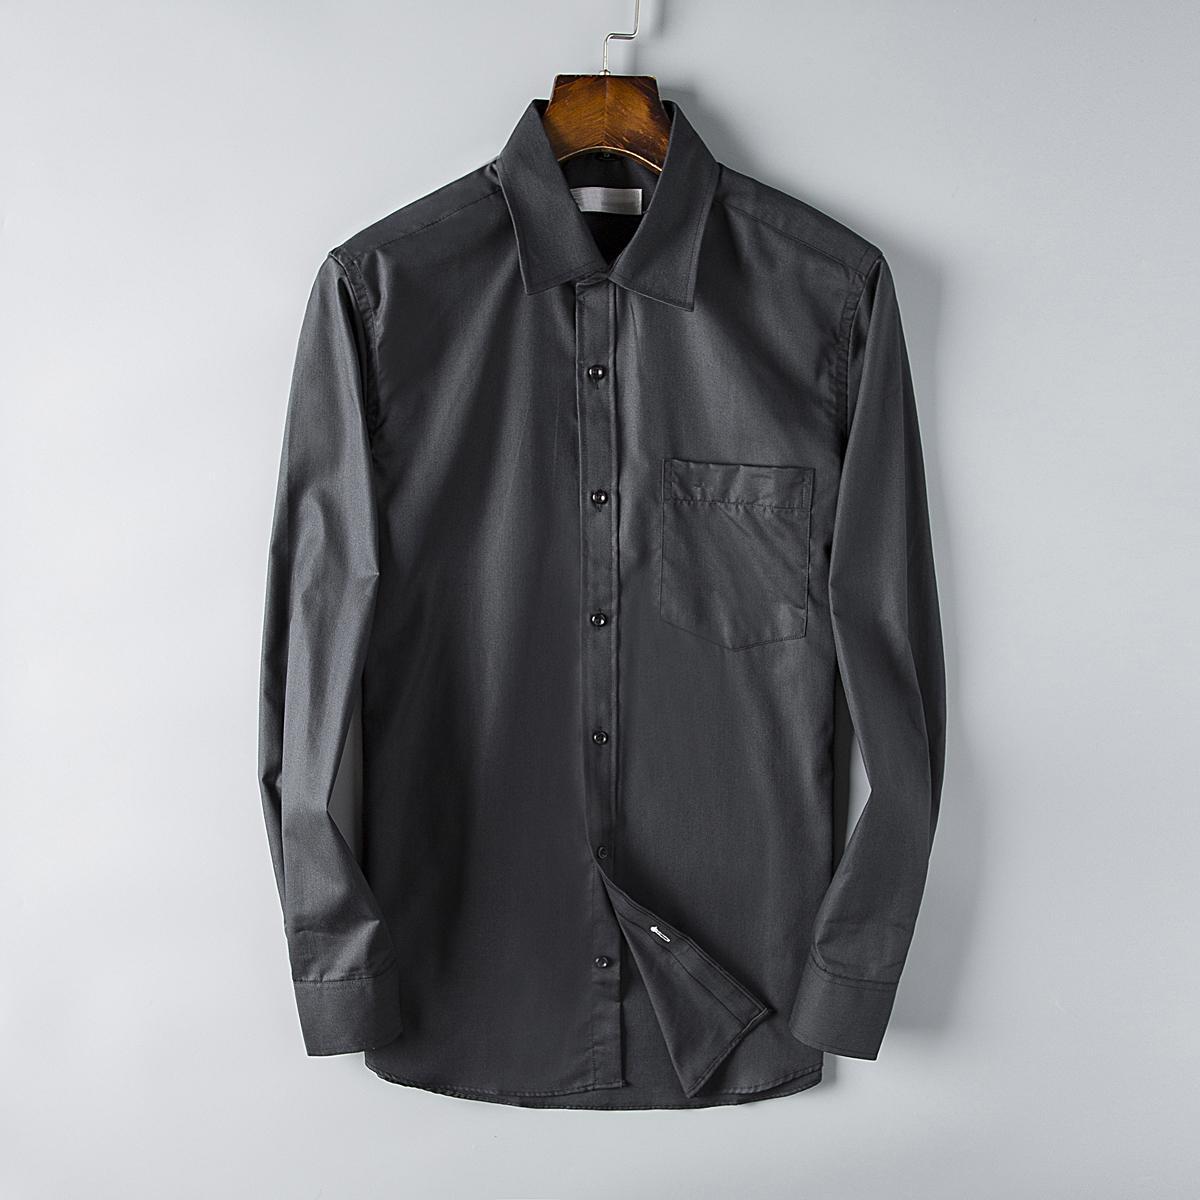 cc58d5be644da5 France Brand Mens Shirts Casual Paris Business Shirt Long Sleeve ...